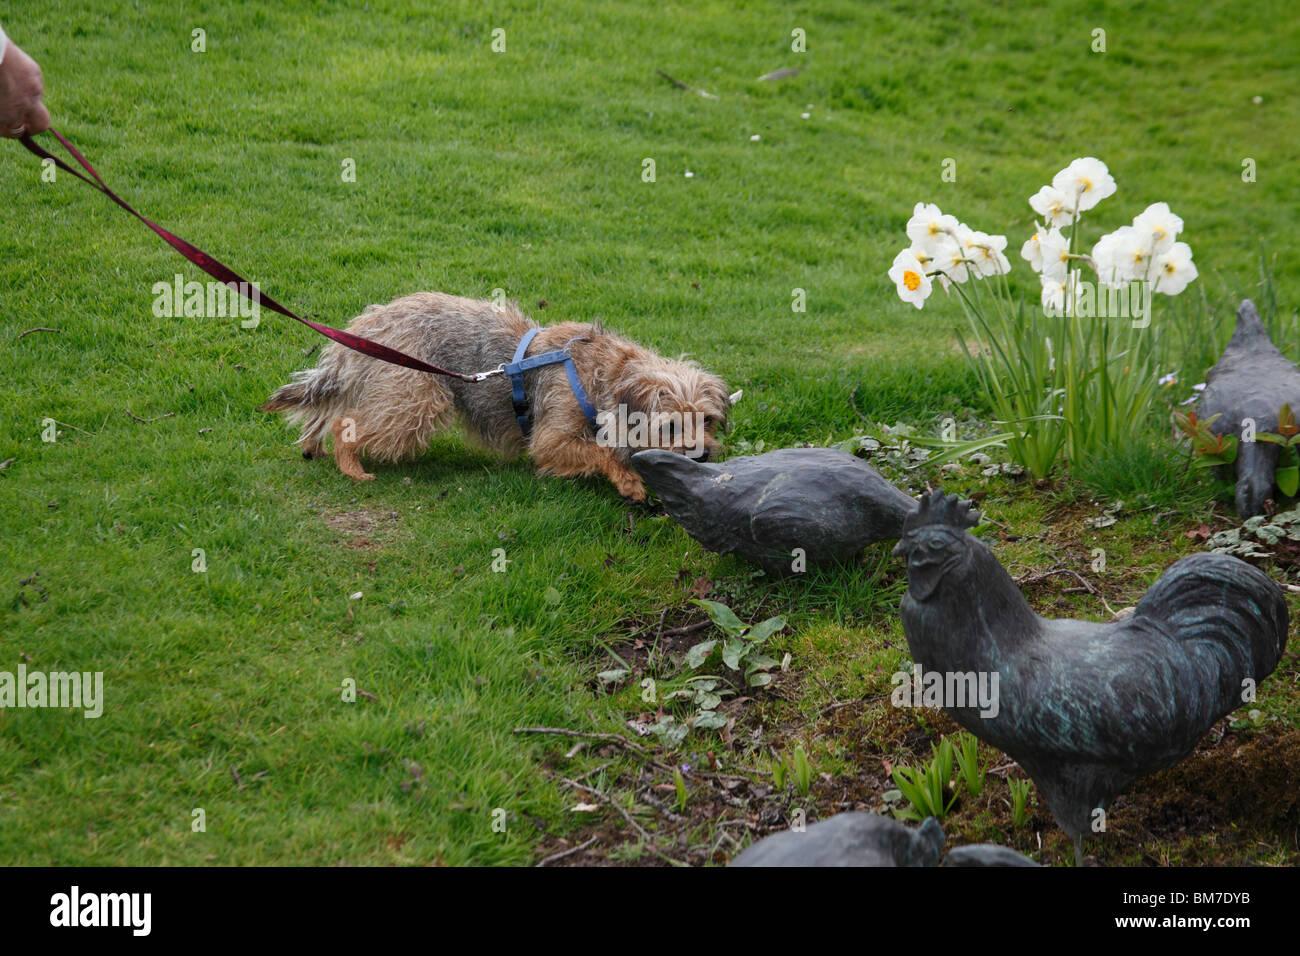 Border Terrier approaching bronze chickens in garden - Stock Image